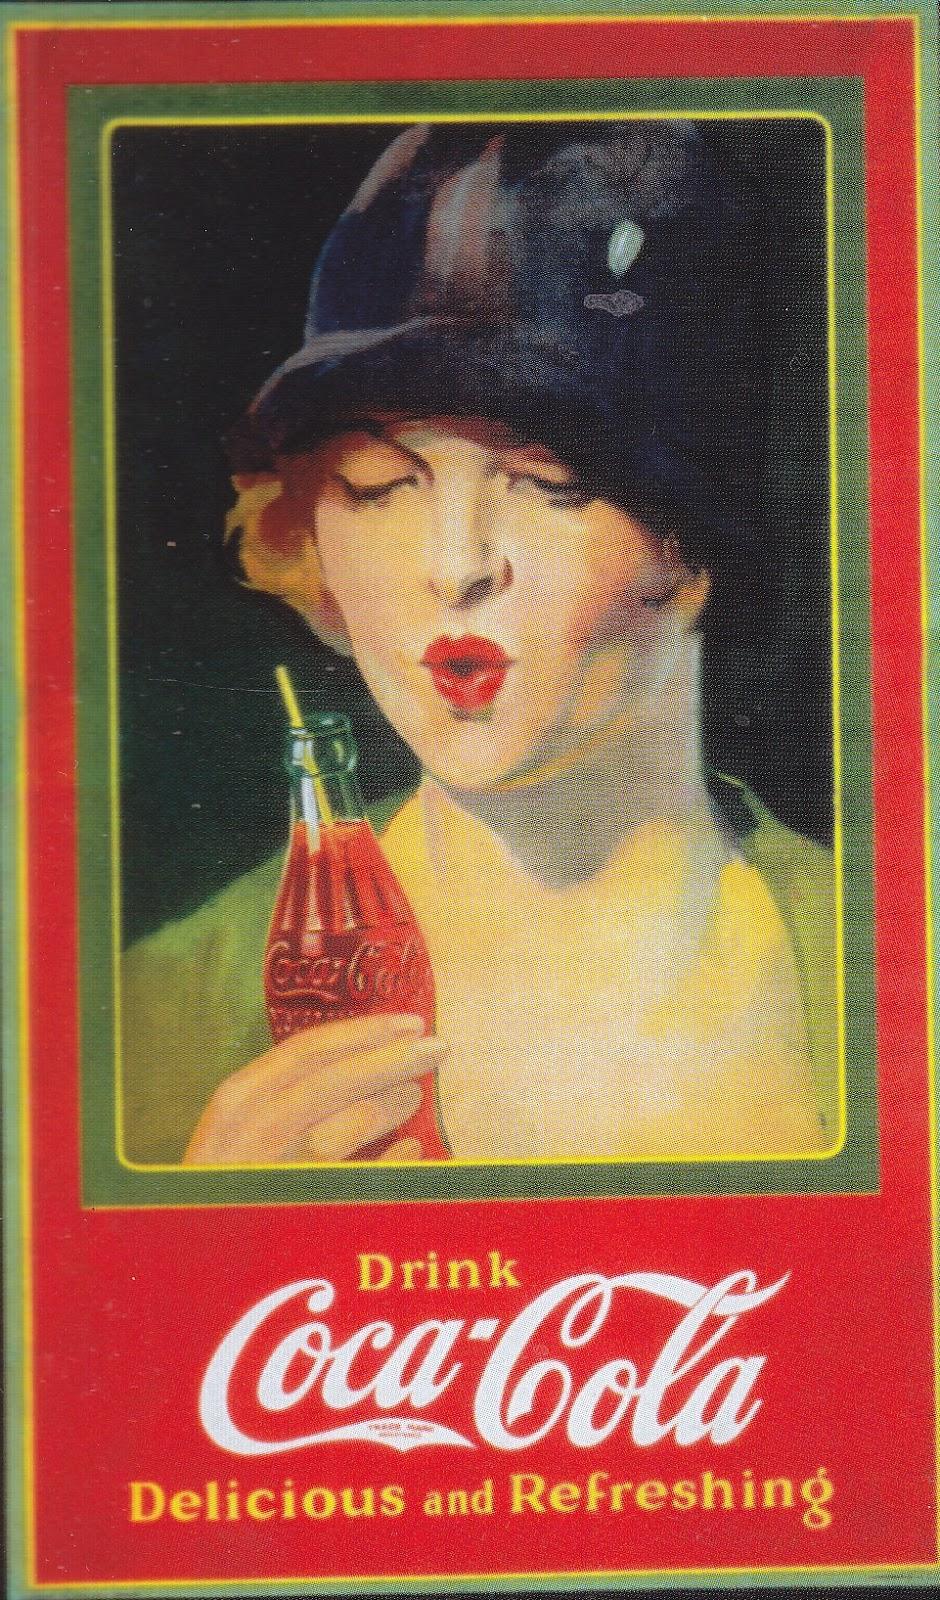 Vintage Soft Drink Advertising 1920 S Flapper Enjoying A Coke